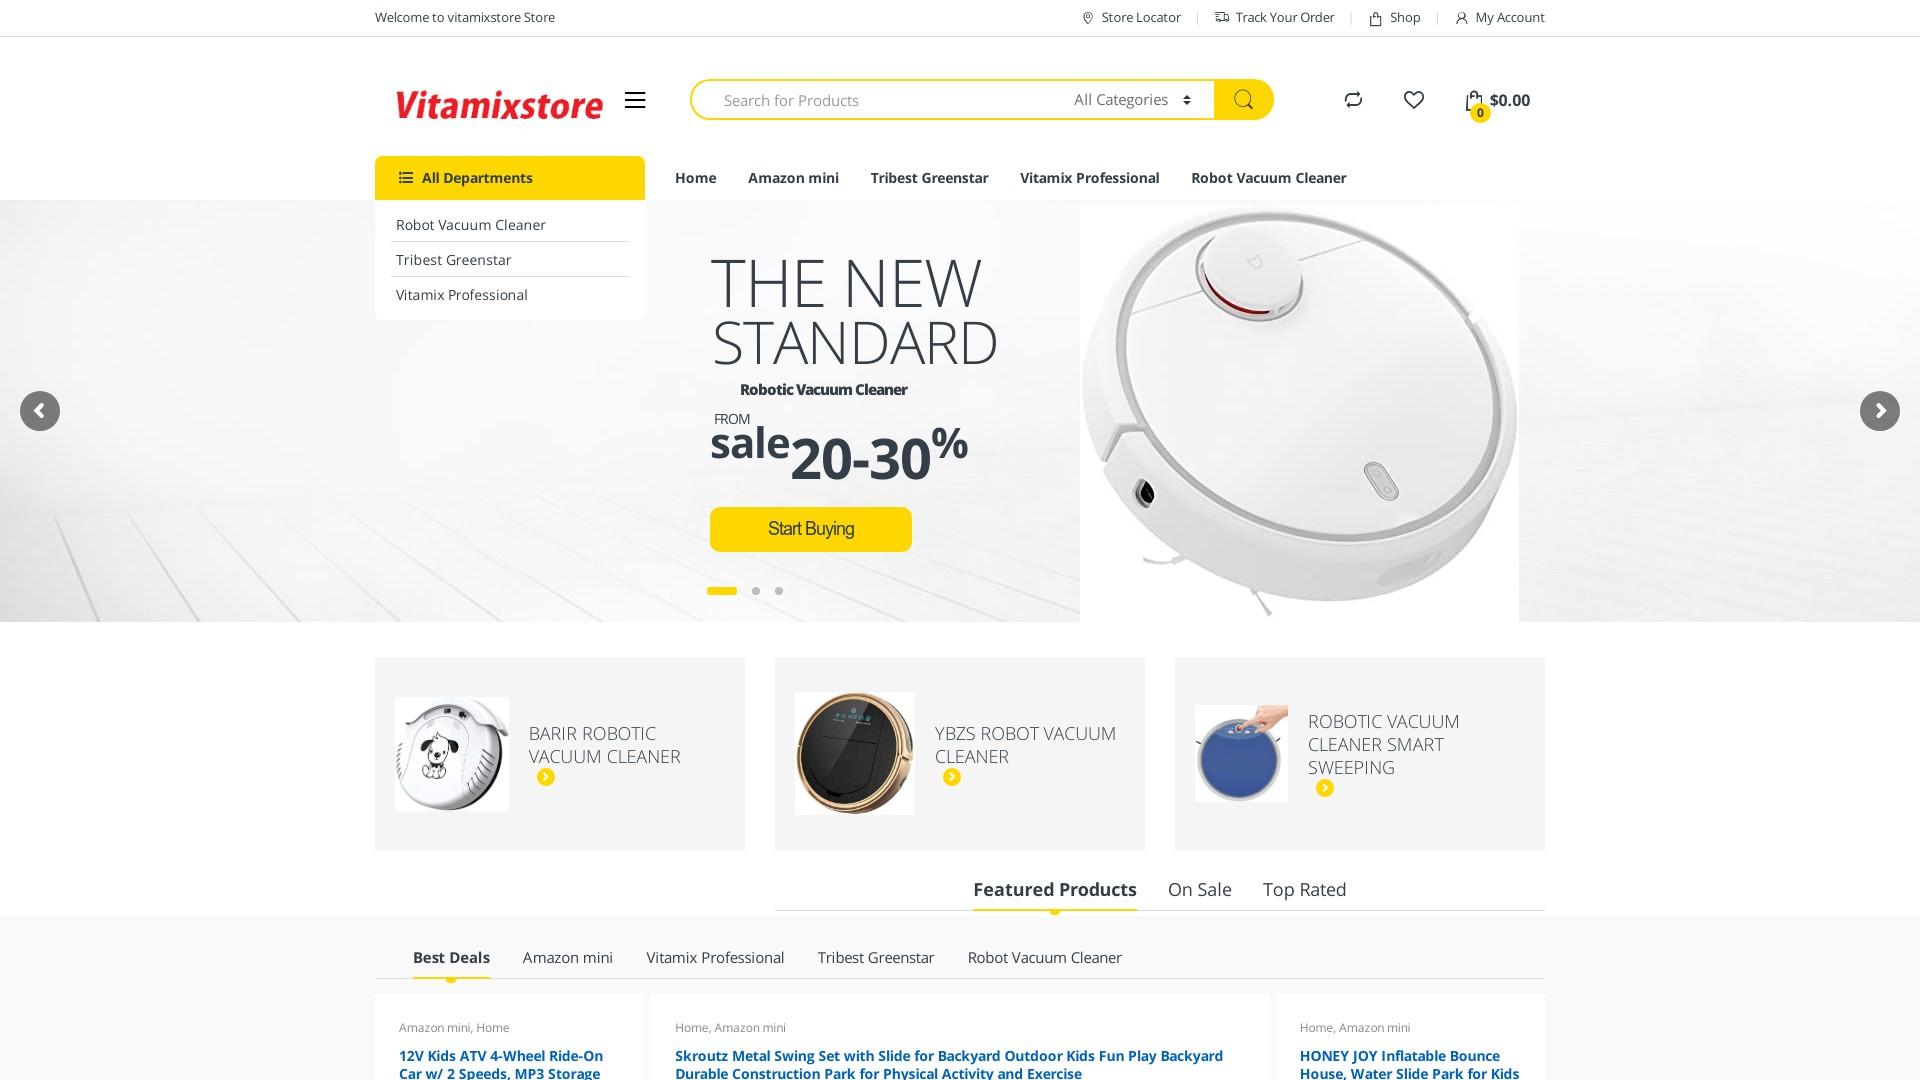 Is Vitamix Store a Scam? Review of Vitamixstore.com